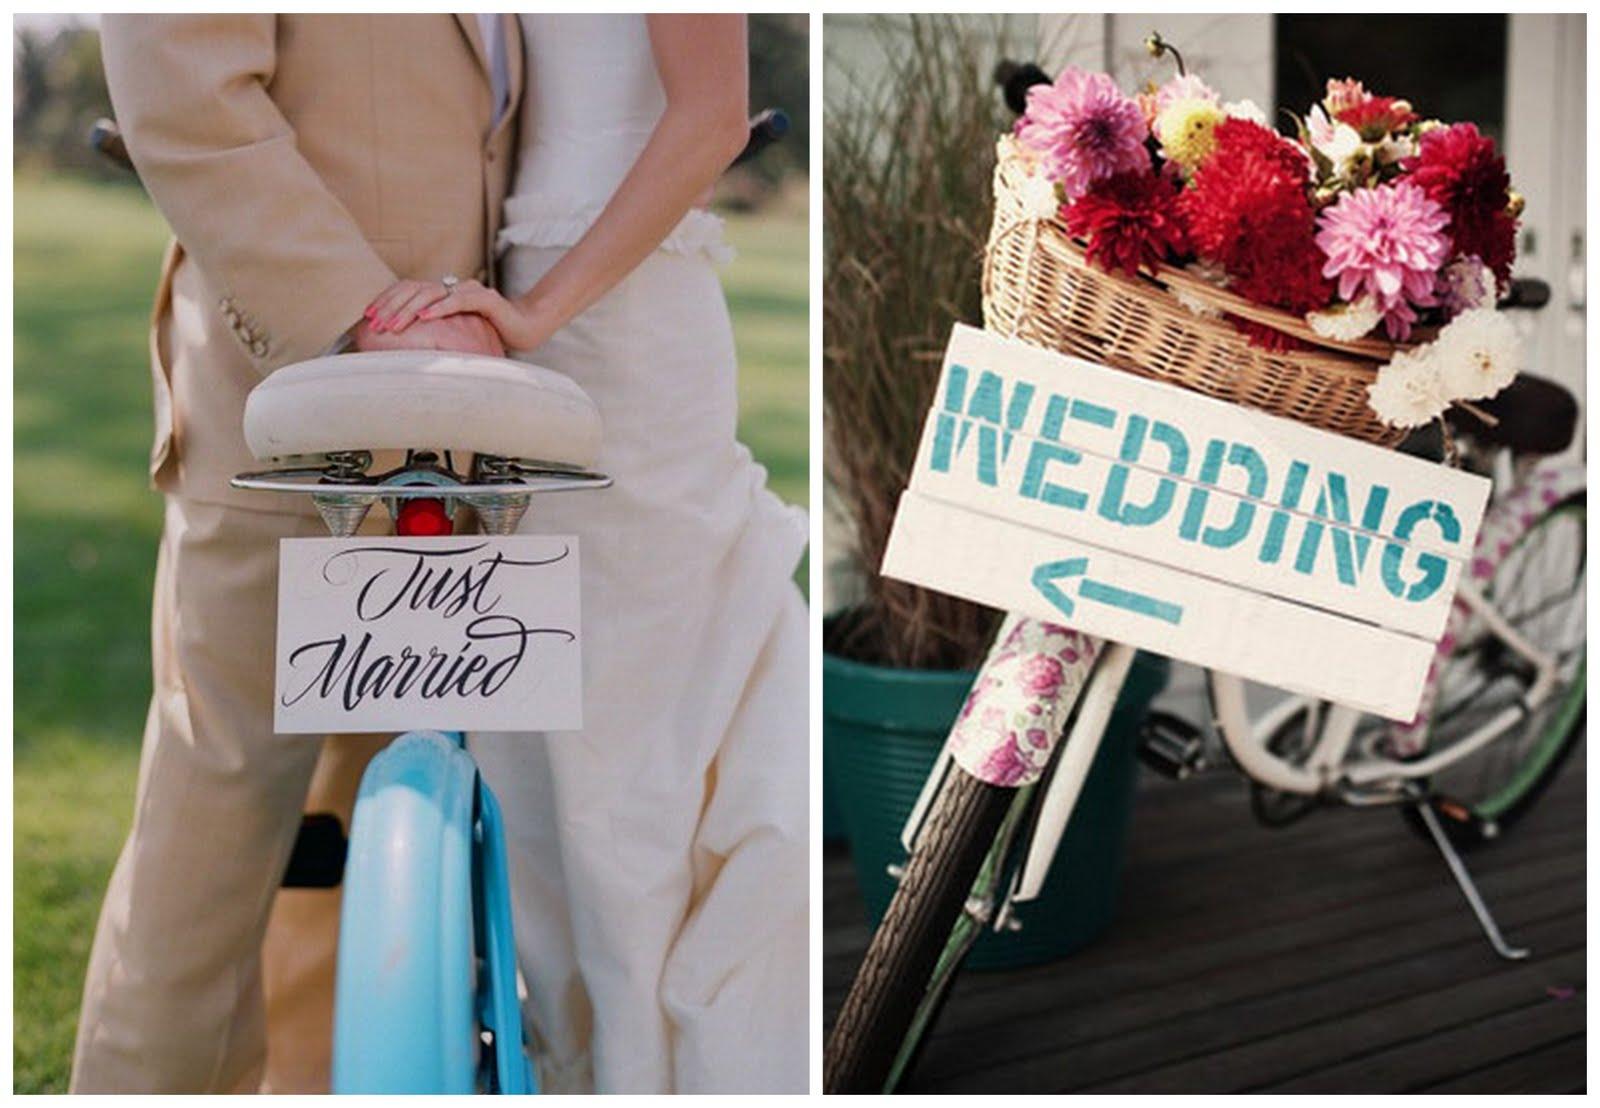 Bicycle-Wedding-Theme-Before-the-Big-Day-Wedding-Blog-UK.jpg